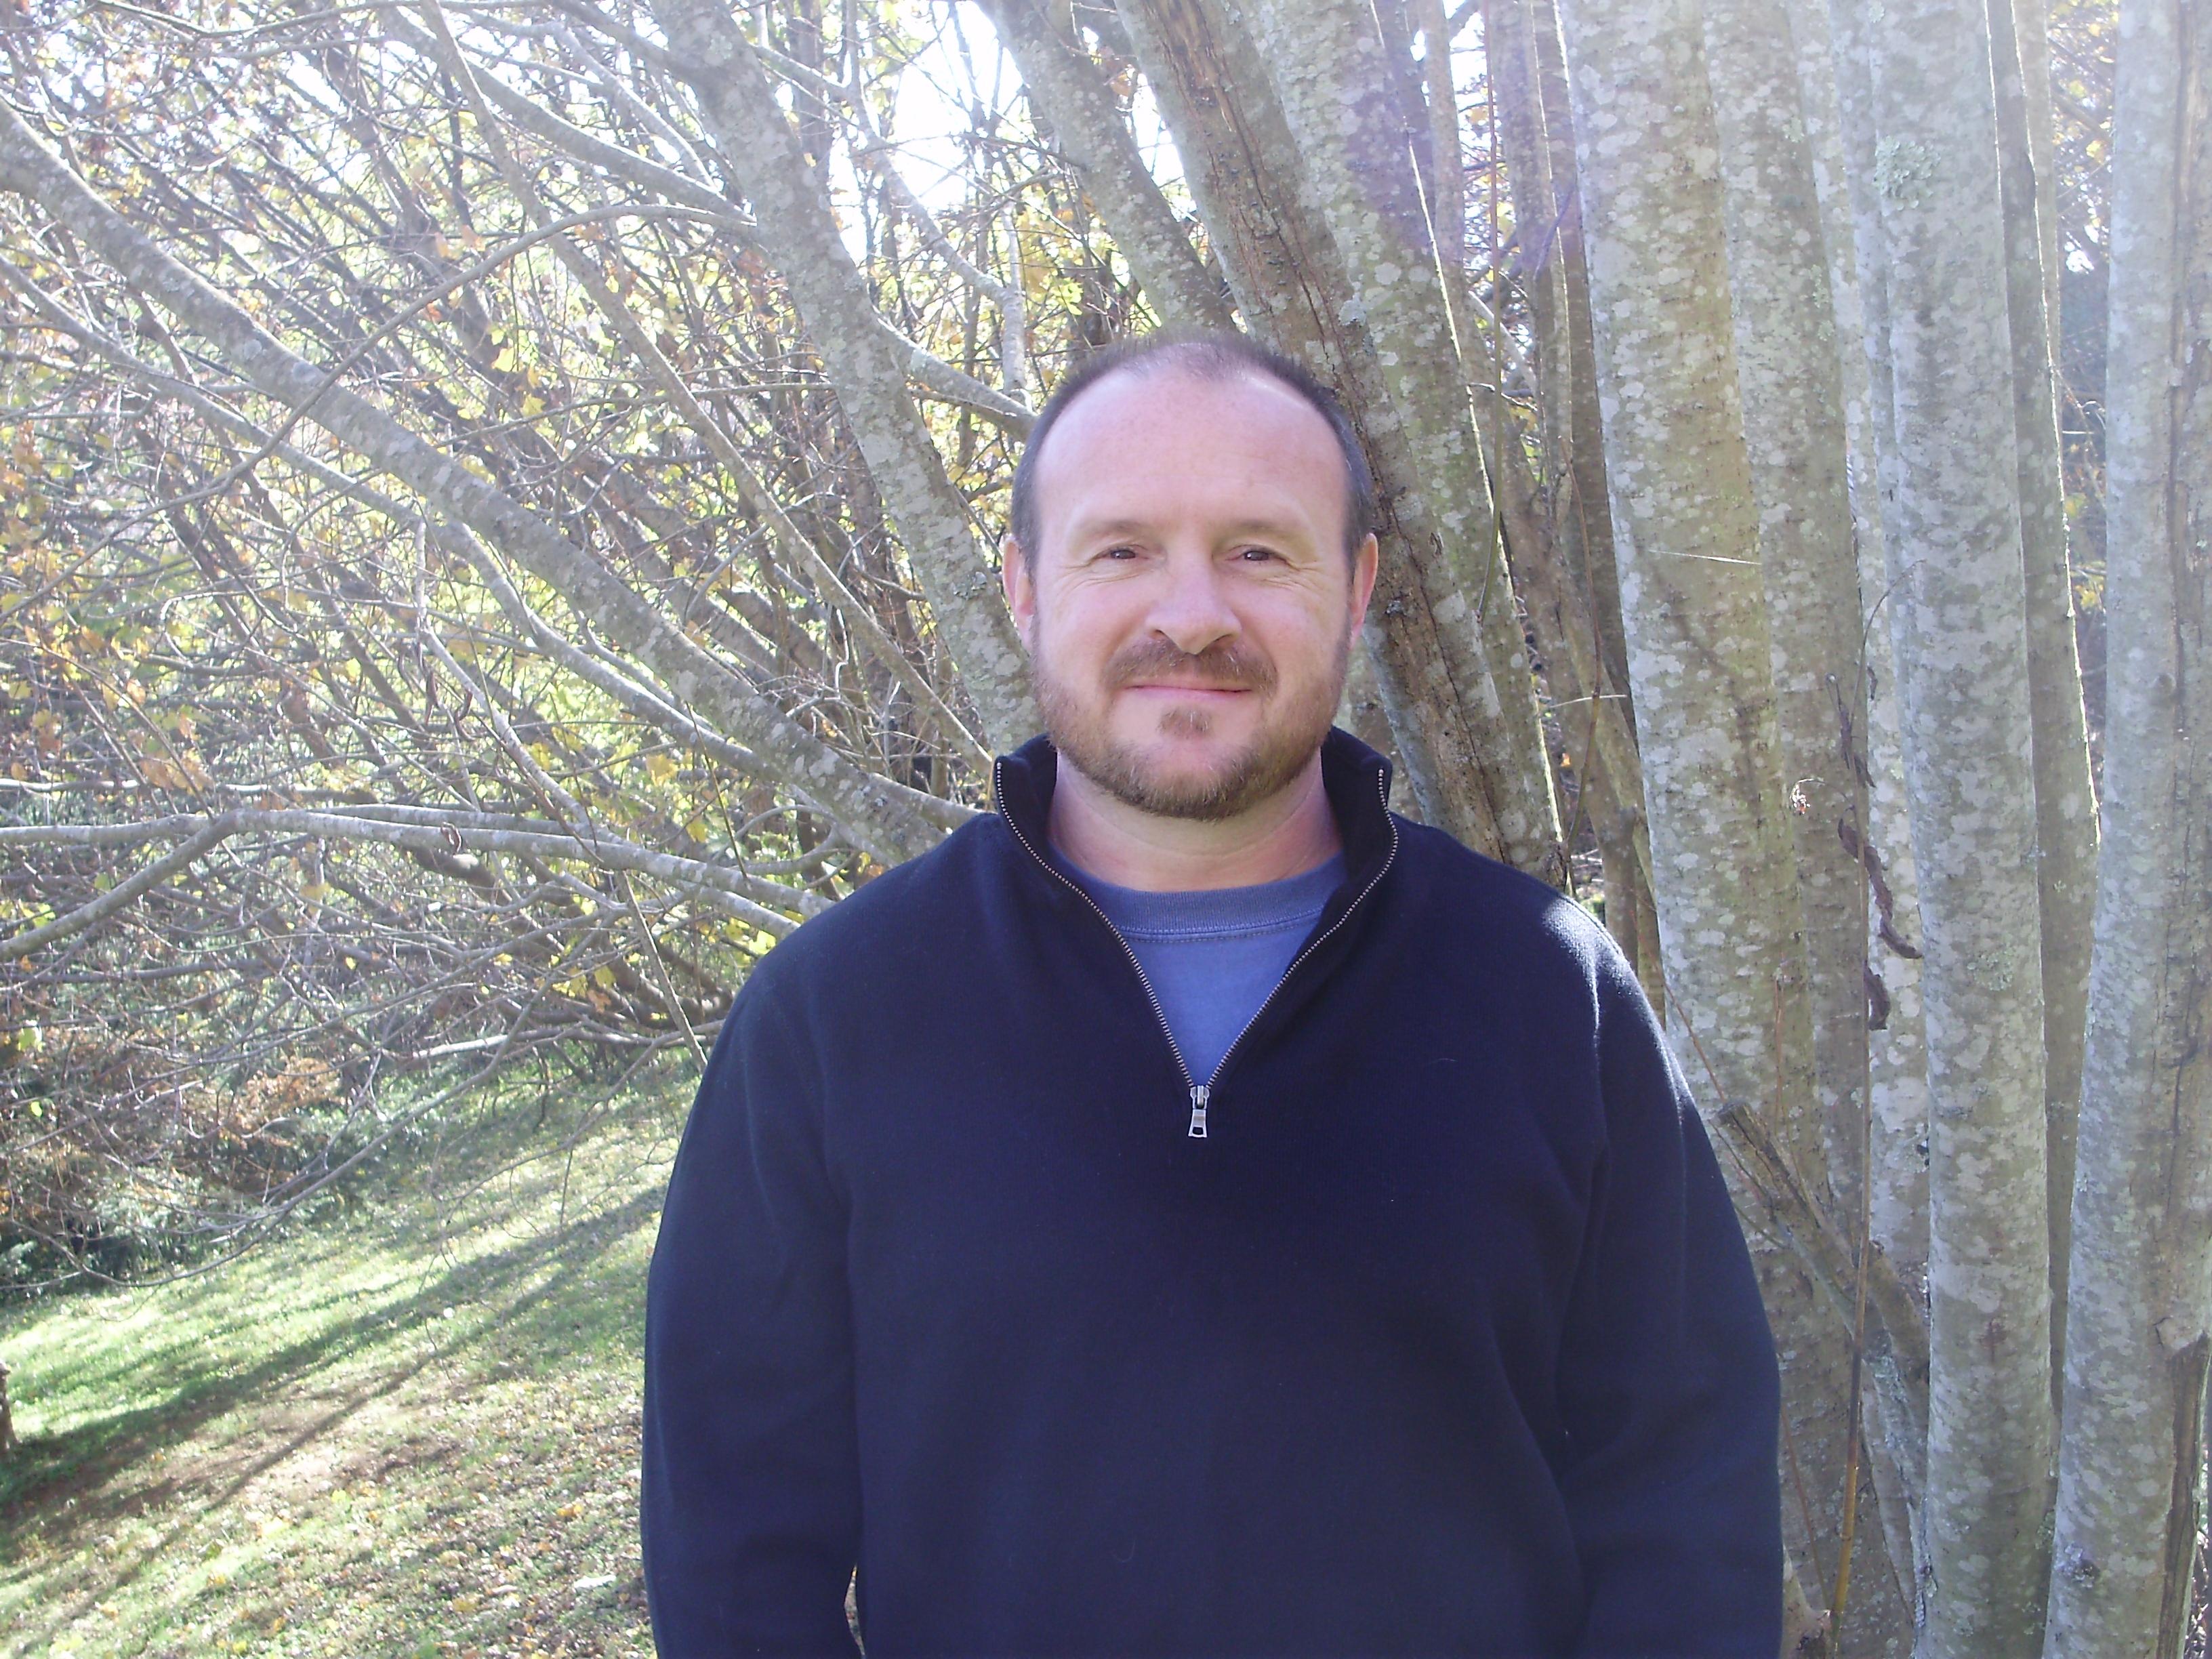 Ray Harris Jr. has a degree in history from James Madison University.